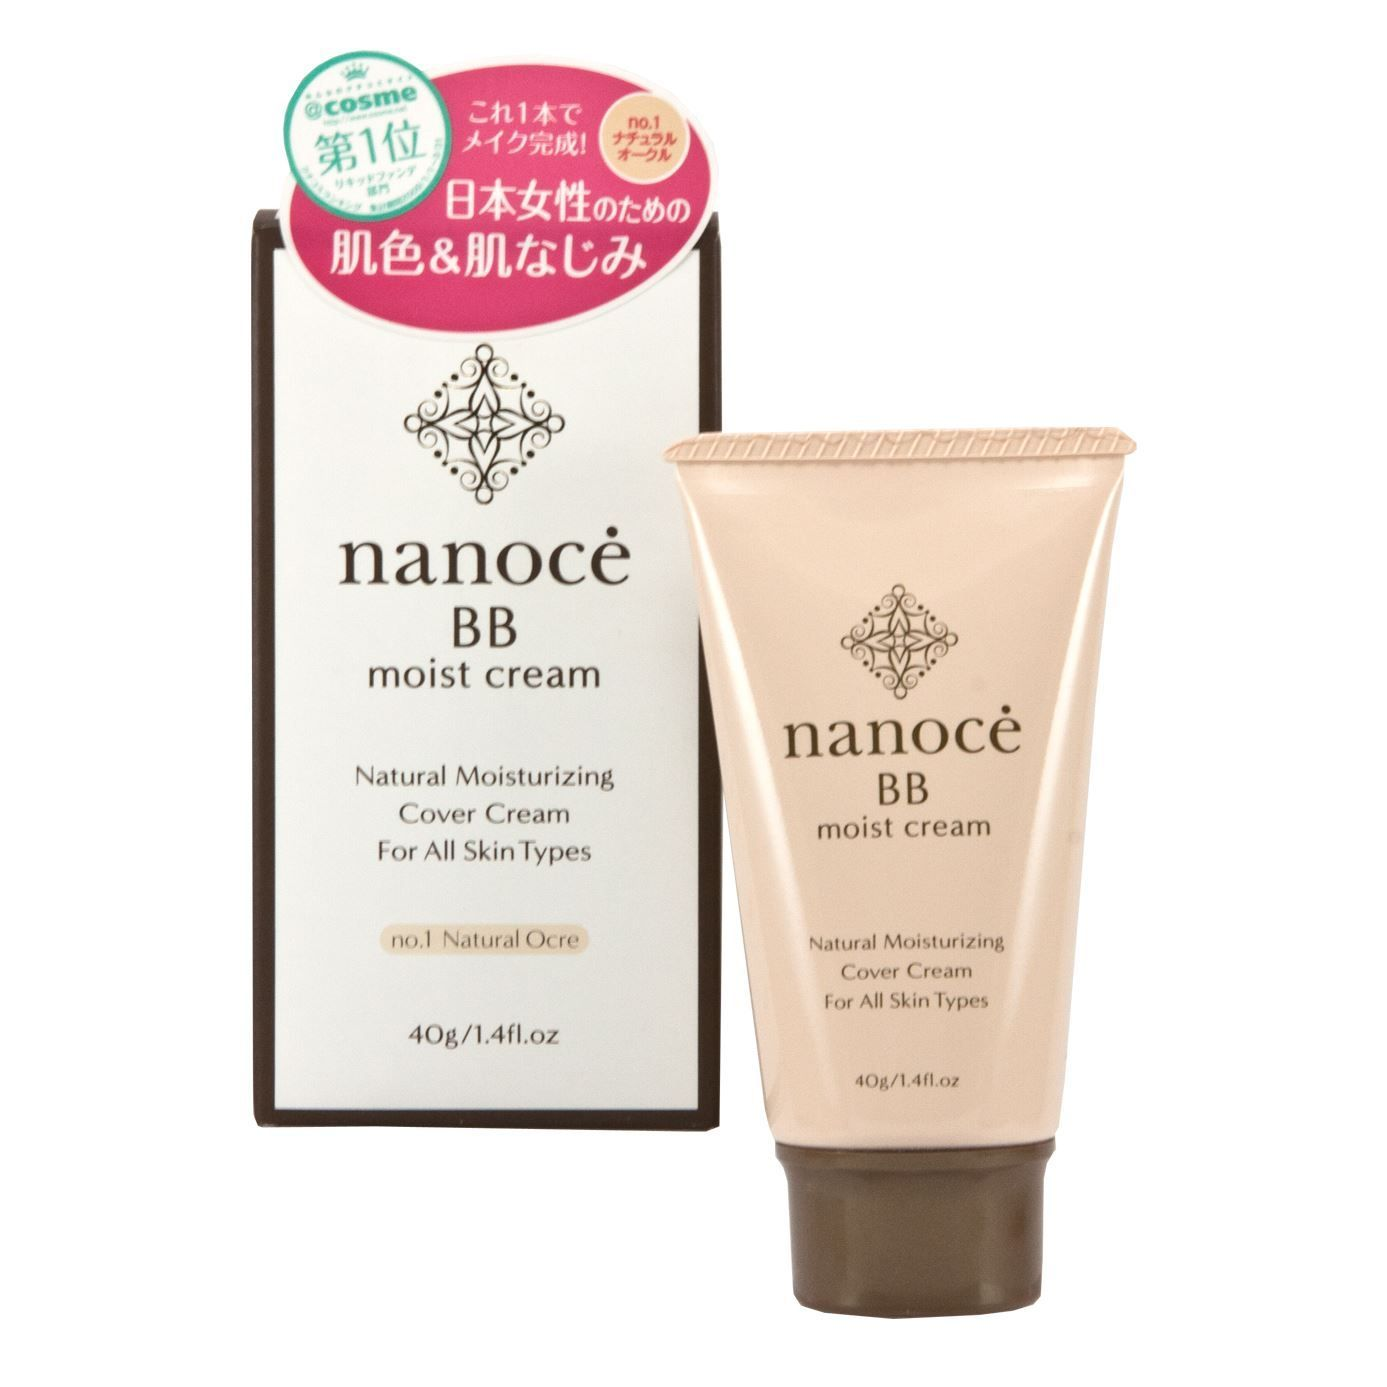 Nanoce BB Moist Cream